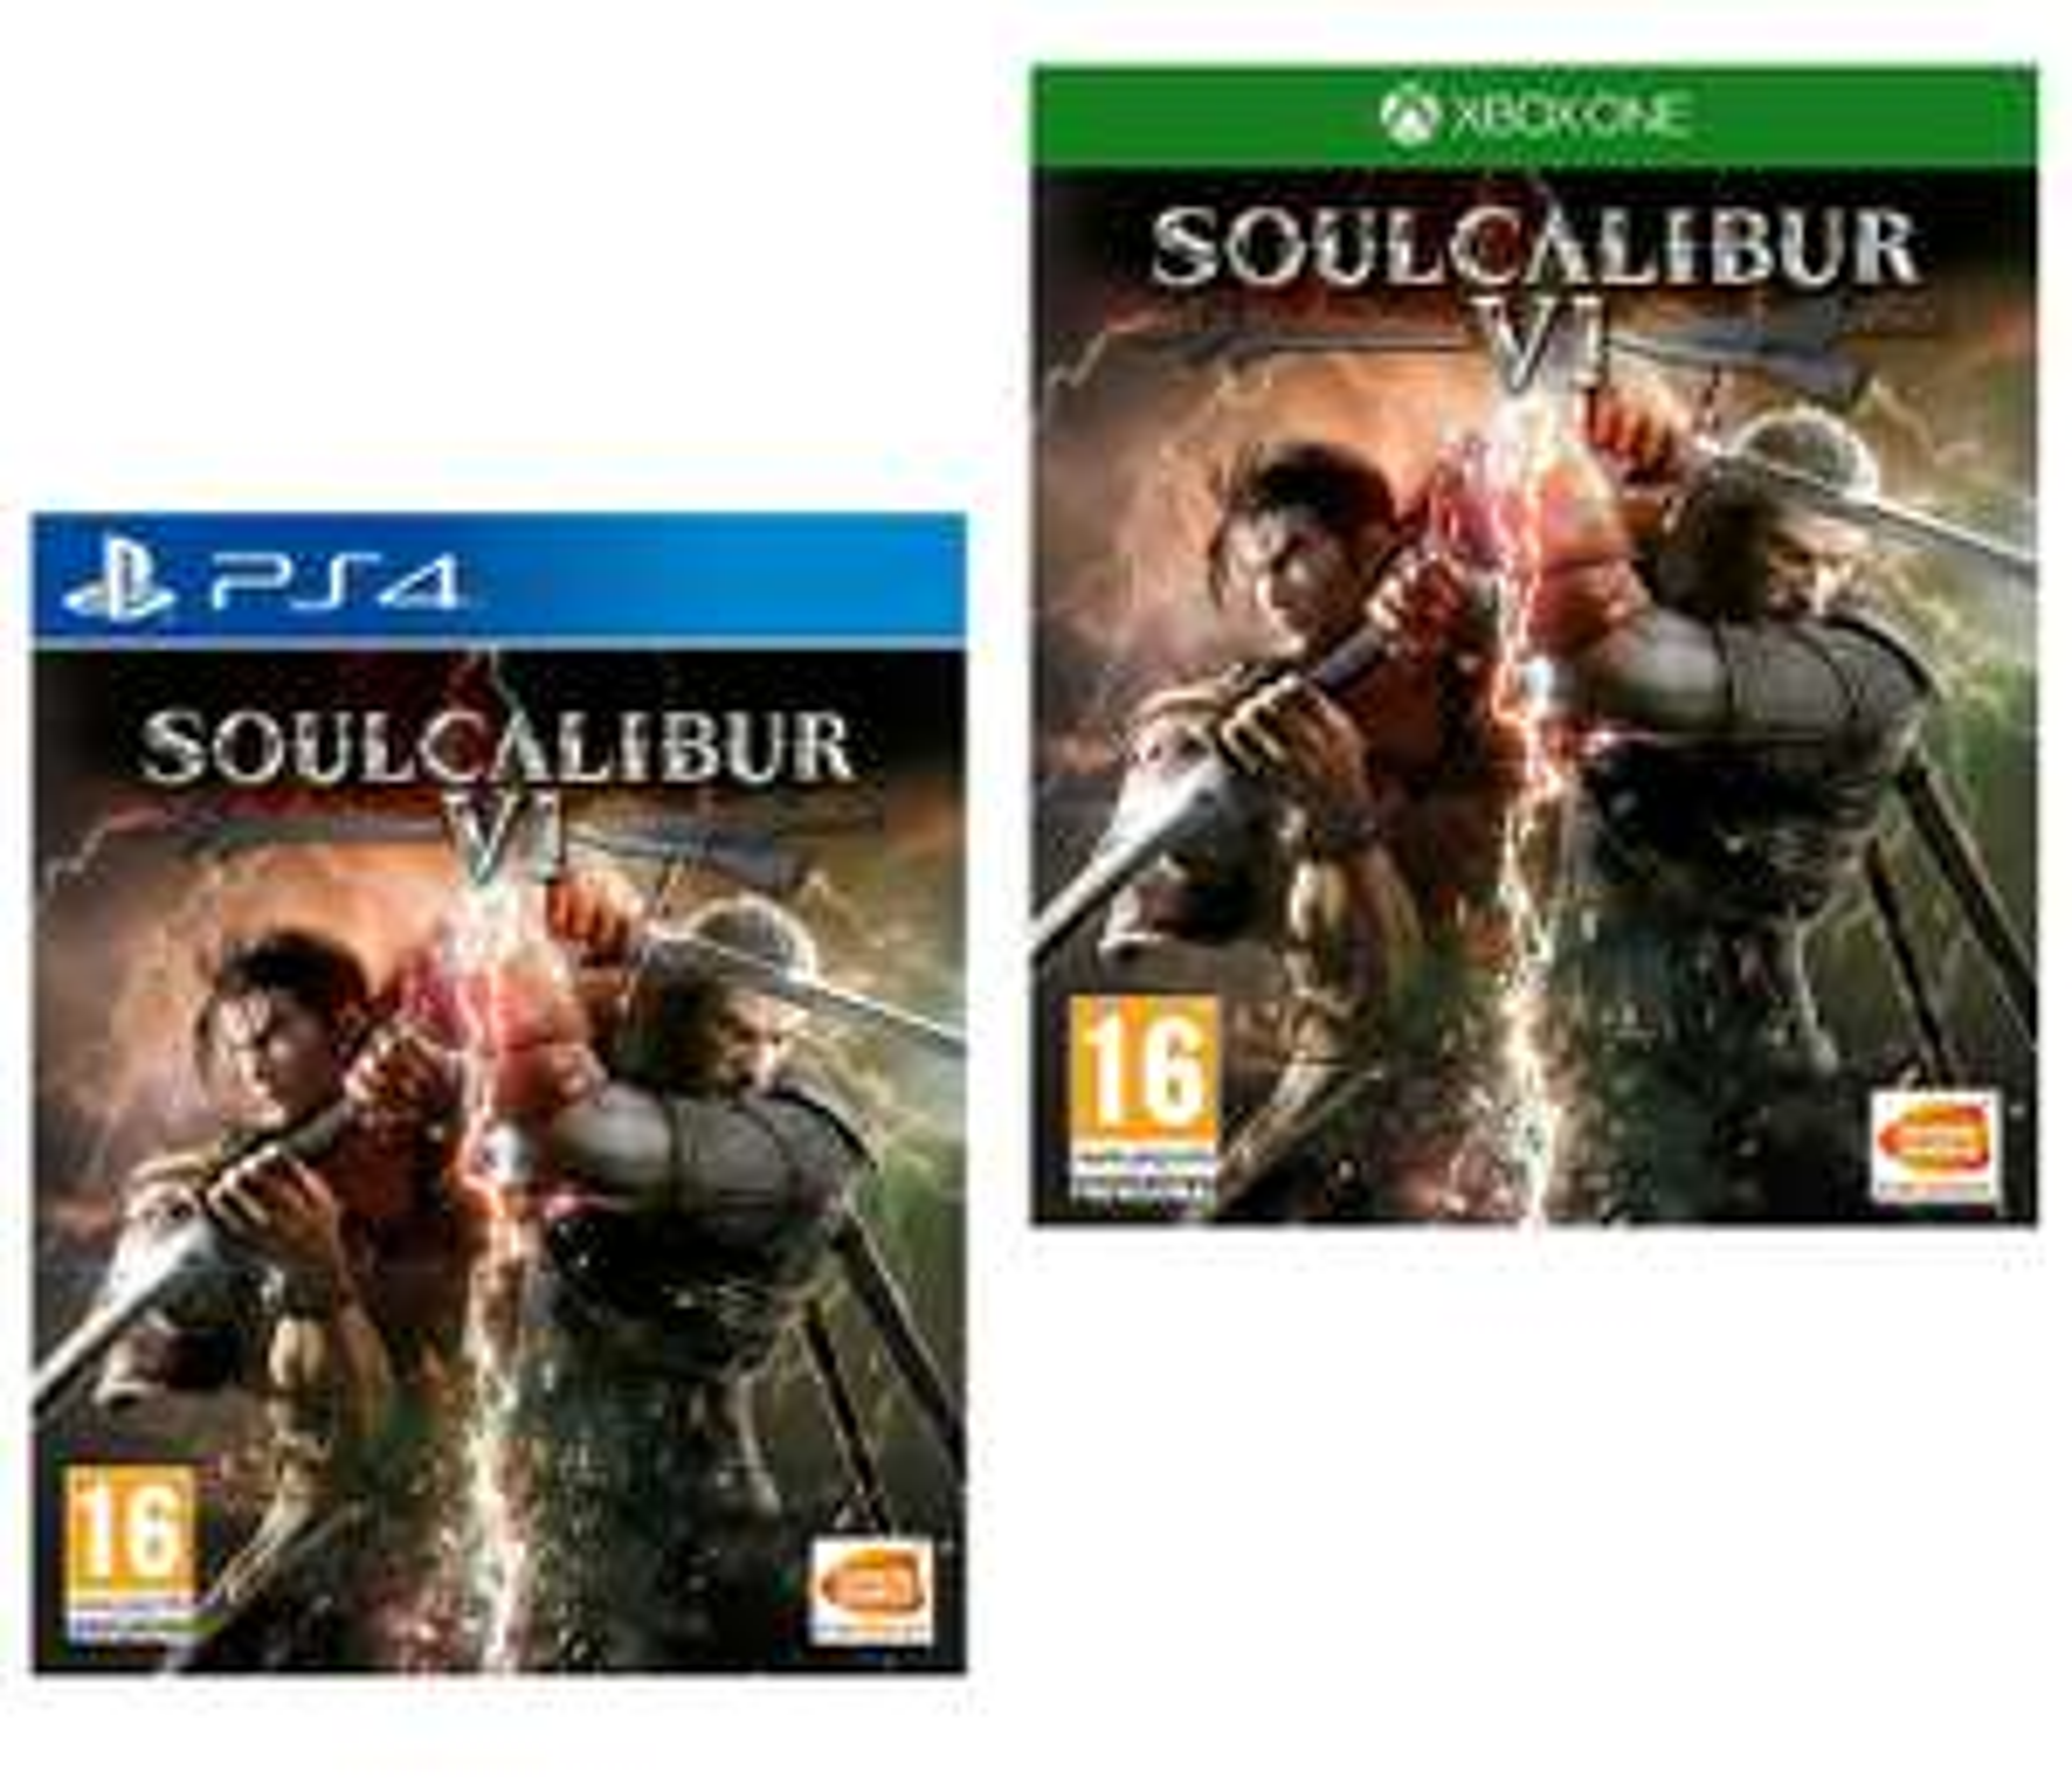 Soulcalibur VI (PS4 / Xbox One) - £12.99 delivered @ Argos / eBay